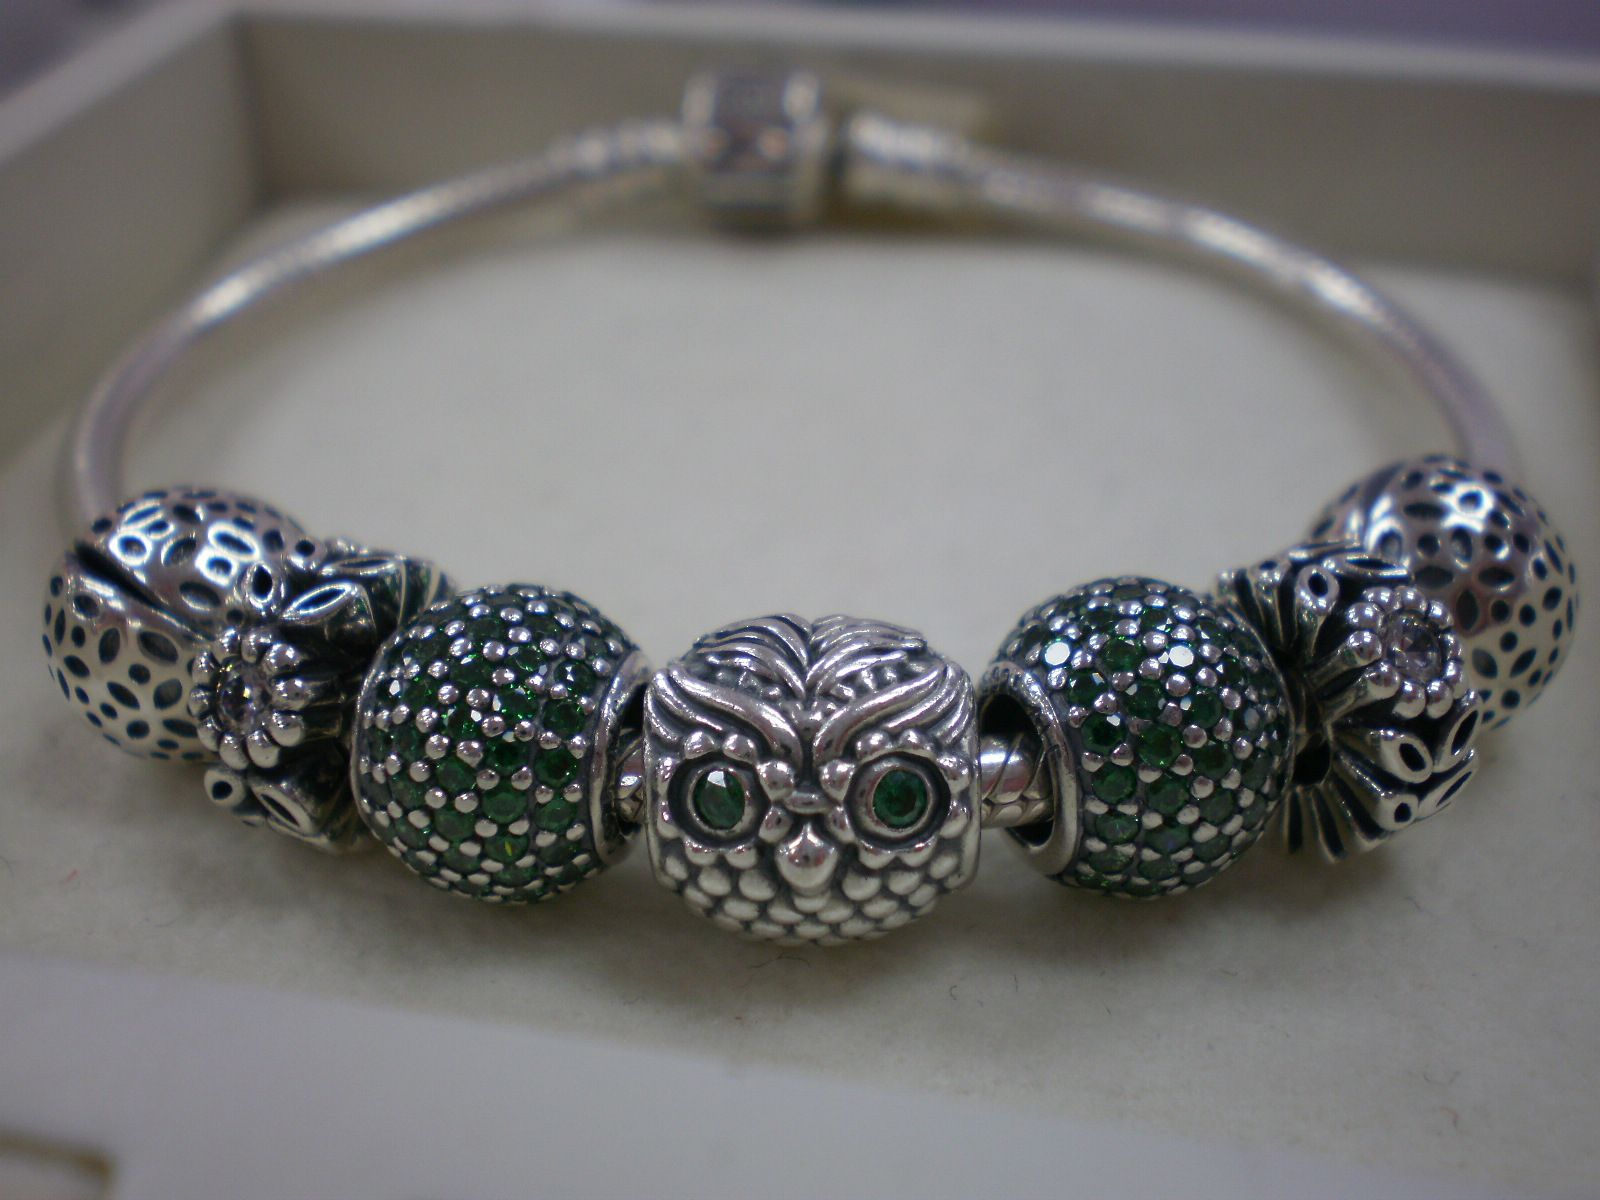 4673517d2 Wise Owl theme bracelet | PANDORA | Pandora bracelets, Pandora, Jewelry